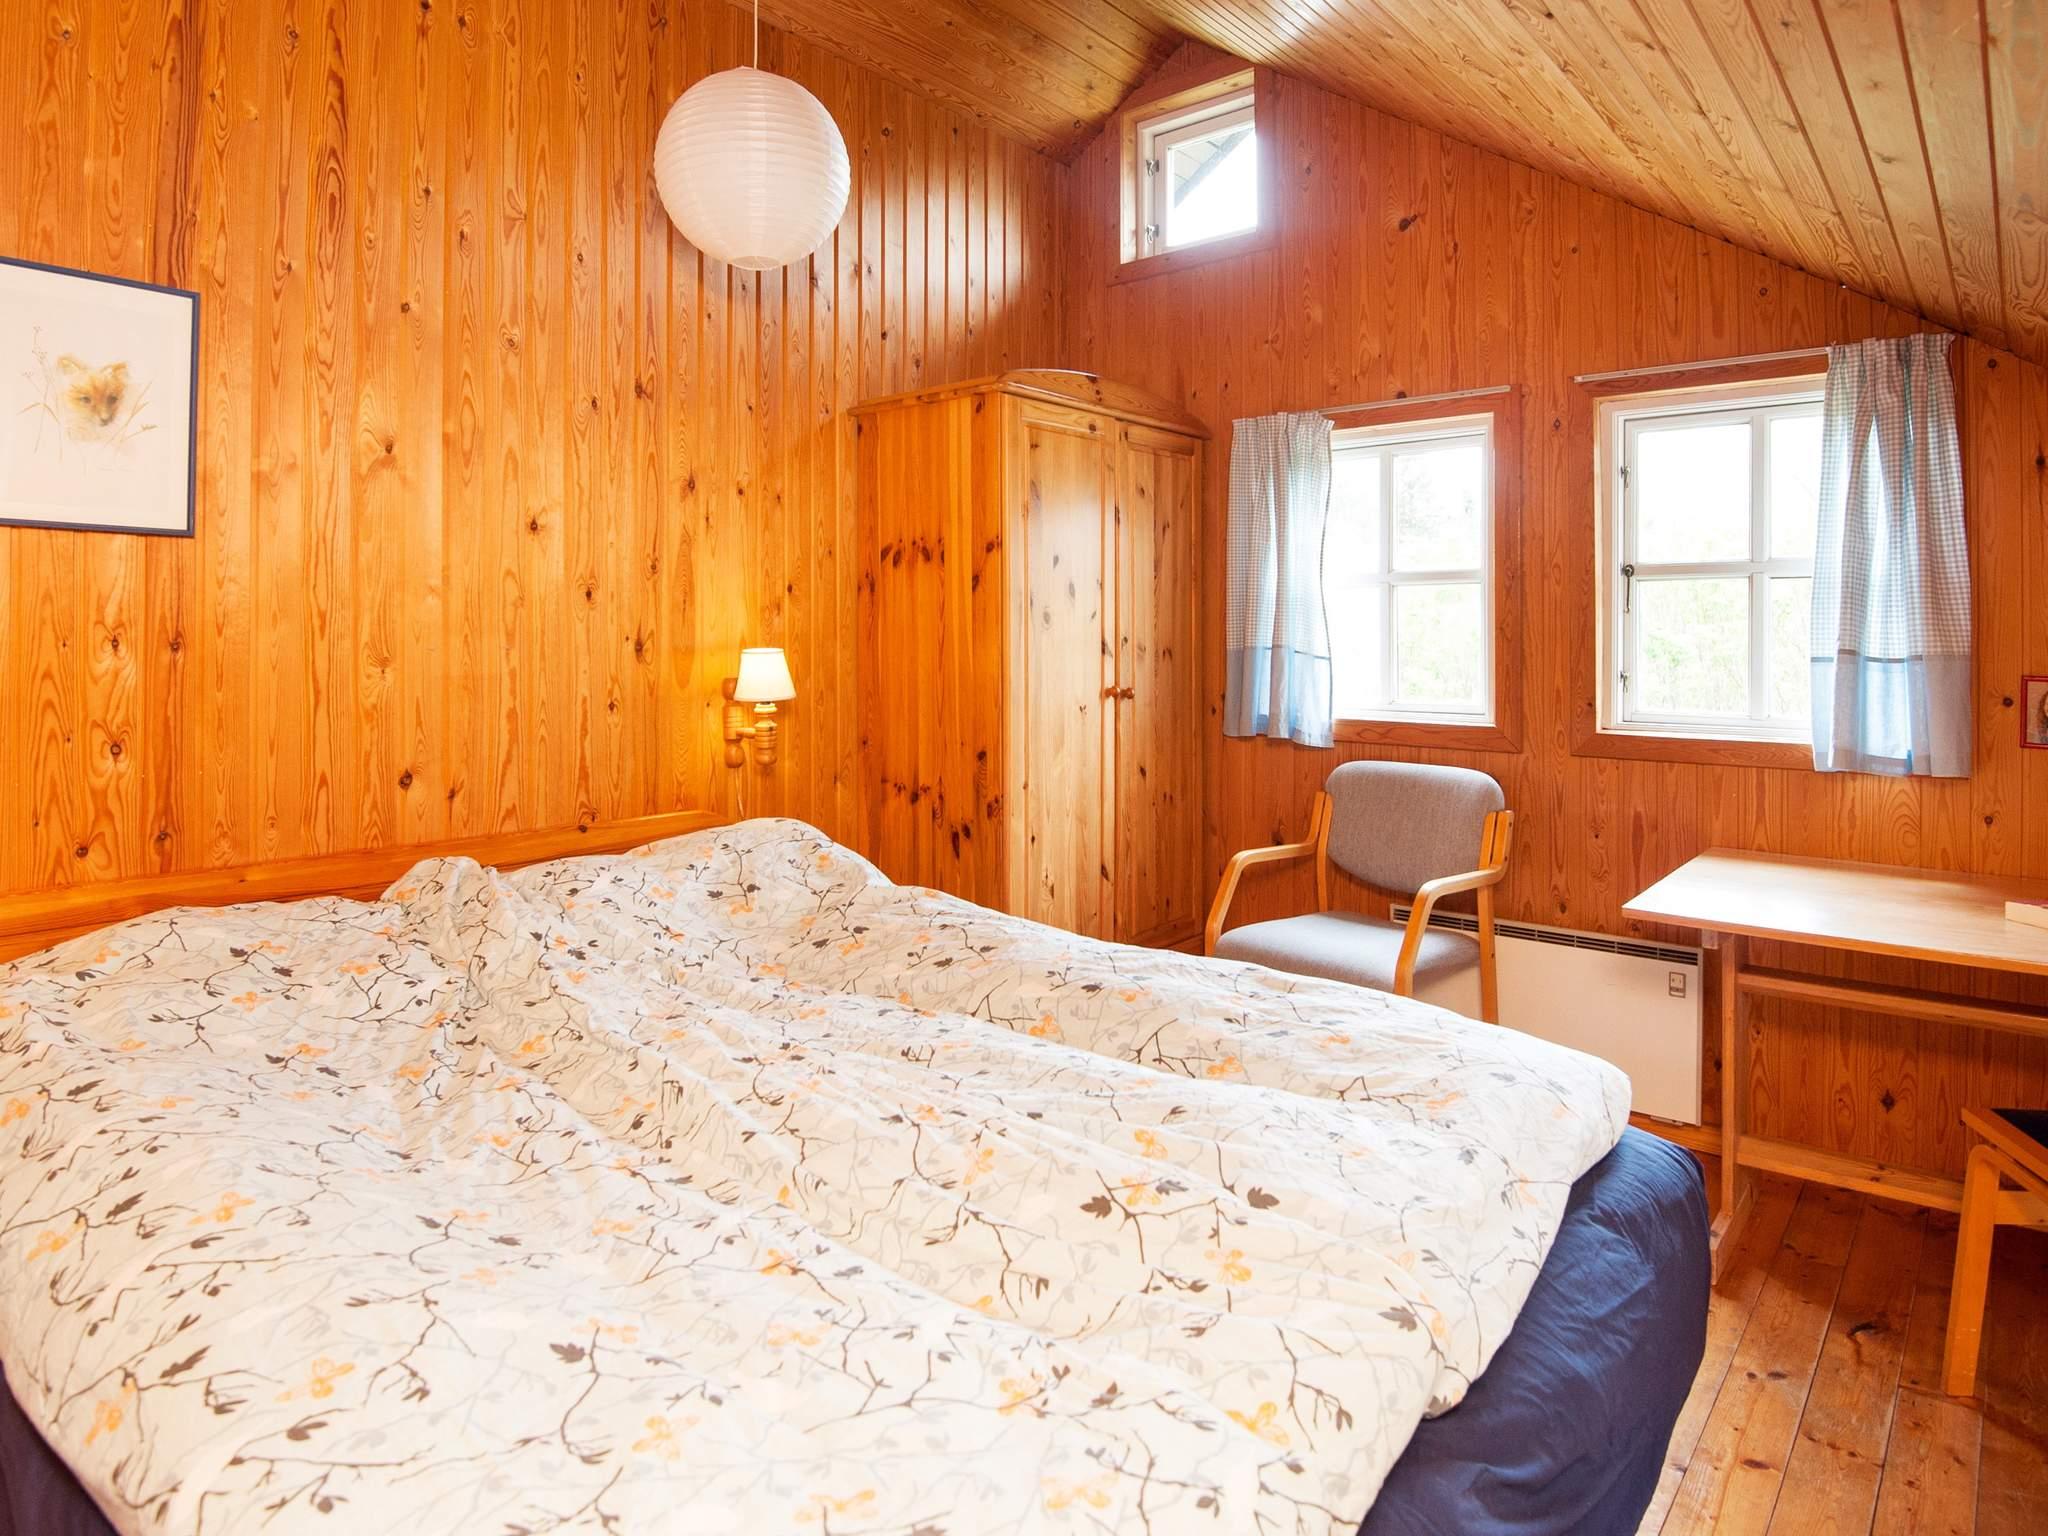 Ferienhaus Ry (83836), Ry, , Ostjütland, Dänemark, Bild 7